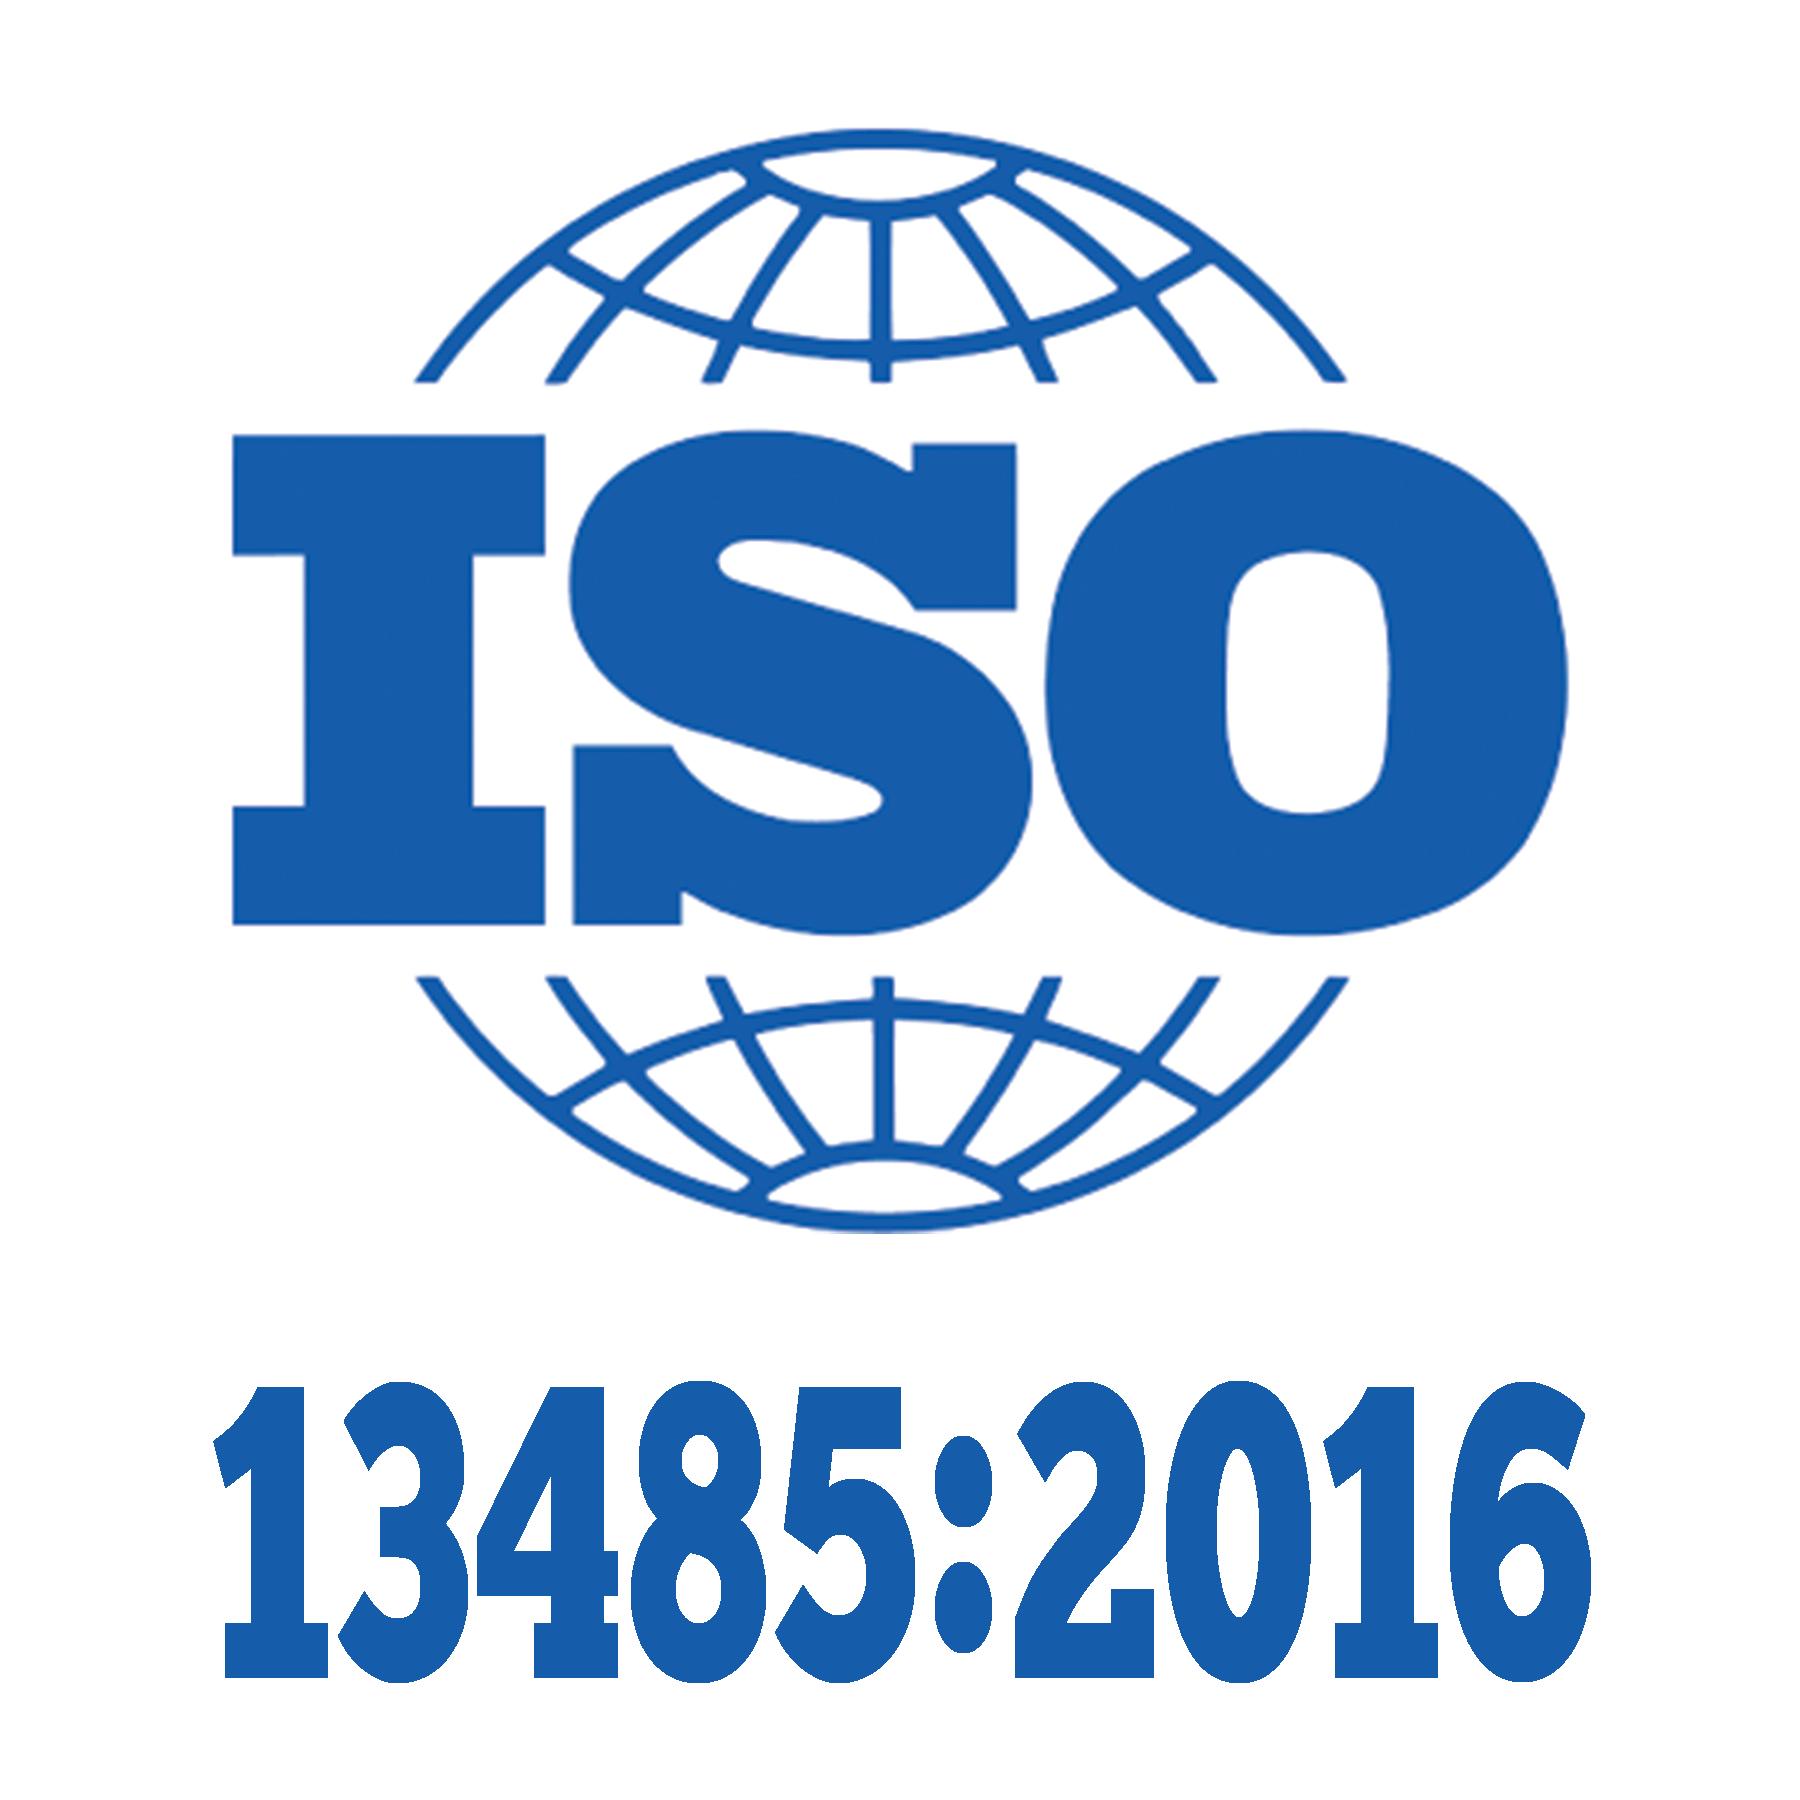 Cybernet ISO 13485:2016